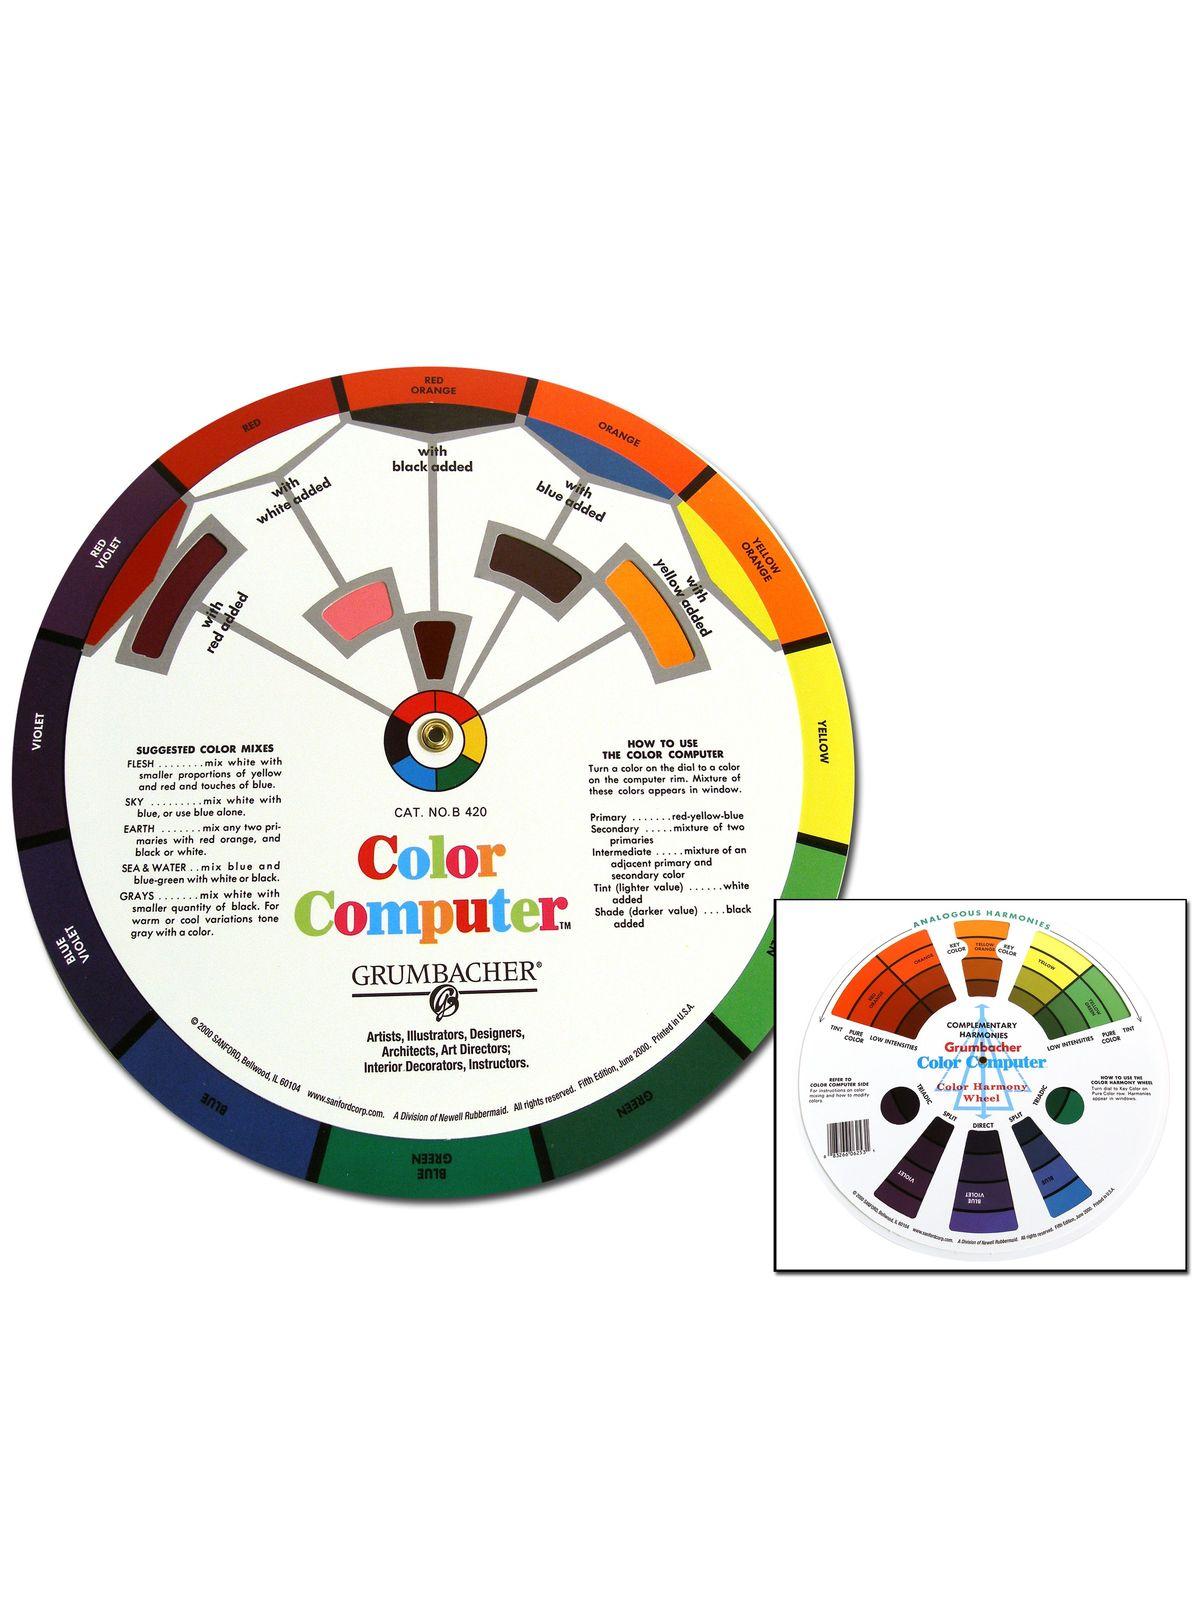 Grumbacher - Color Computer